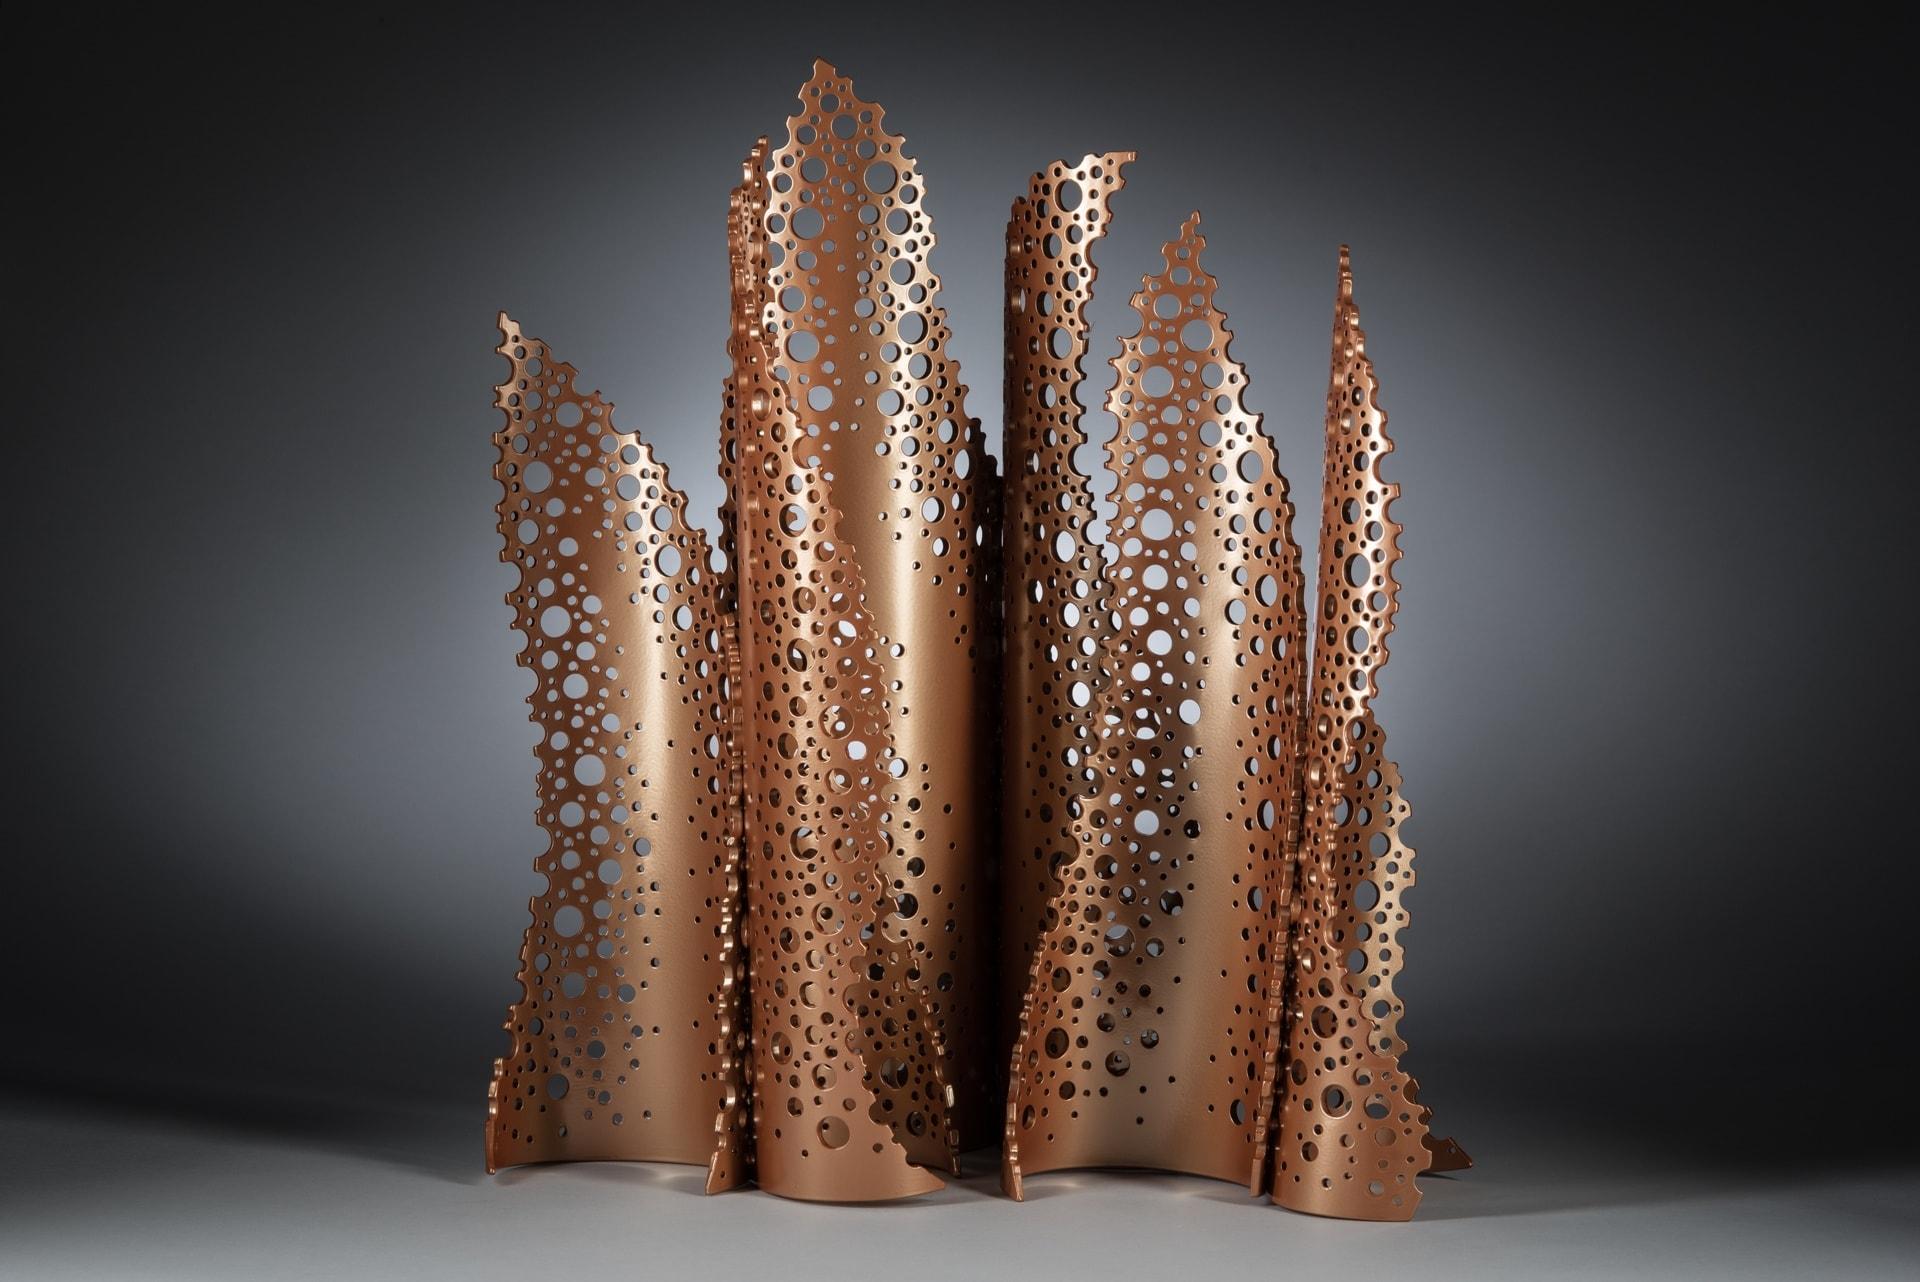 Michael Enn Sirvet, Kasha-Katuwe, powder-coated aluminum, 19 x 22 x 11 inches